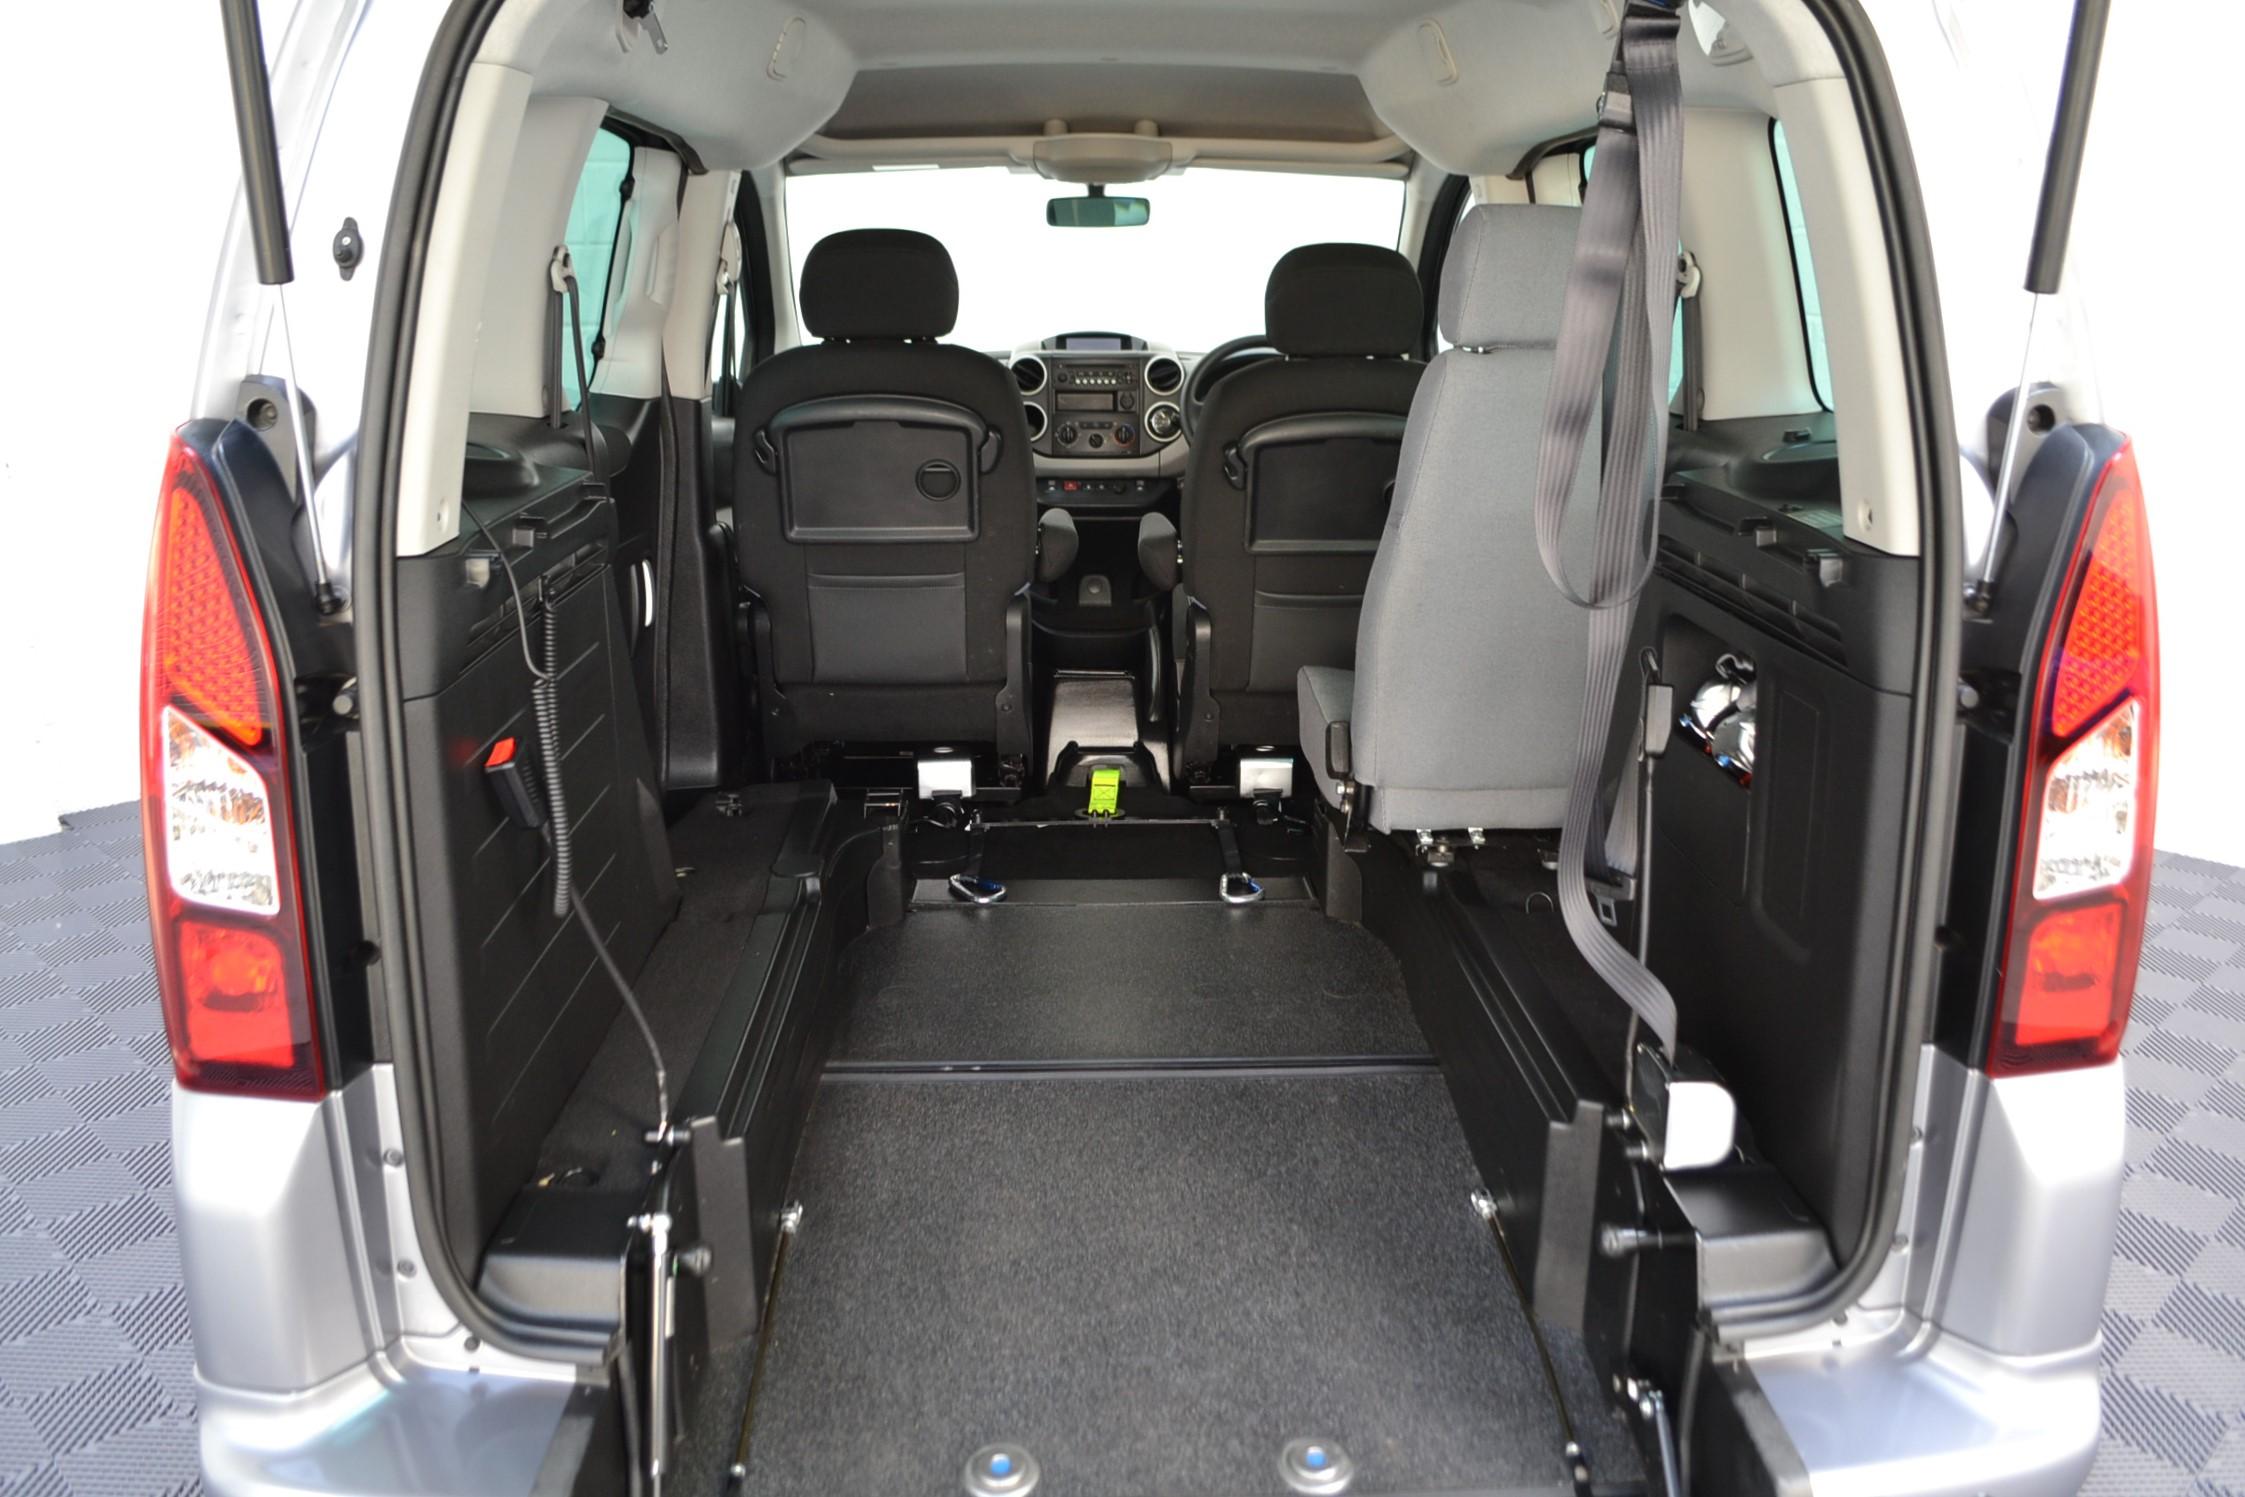 WAV Cars For Sale Bristol Wheelchair Accessible Vehicles Used For Sale Somerset Devon Dorset Bath Peugeot Partner Auto 10